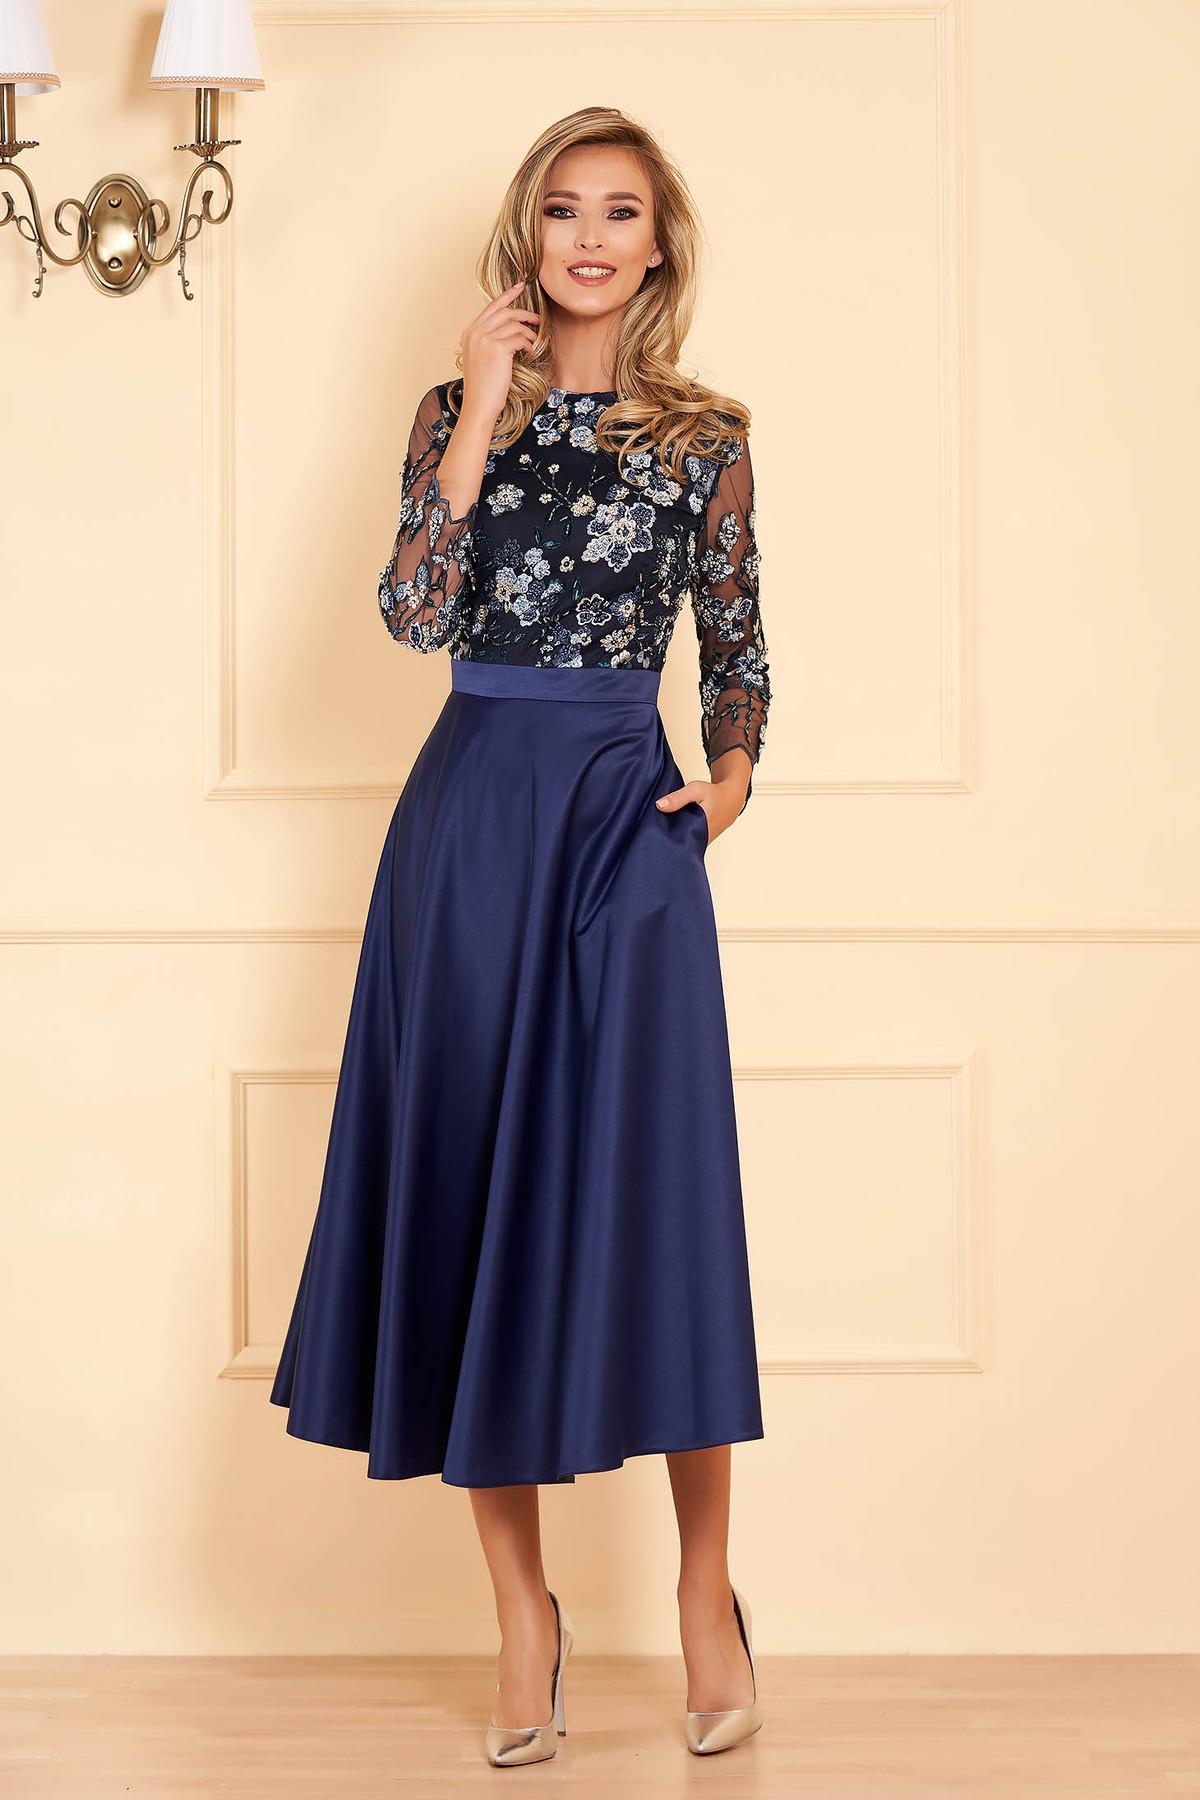 Rochie albastru-inchis de ocazie midi croi in clos din satin si tul brodat cu aplicatii cu margele si paiete